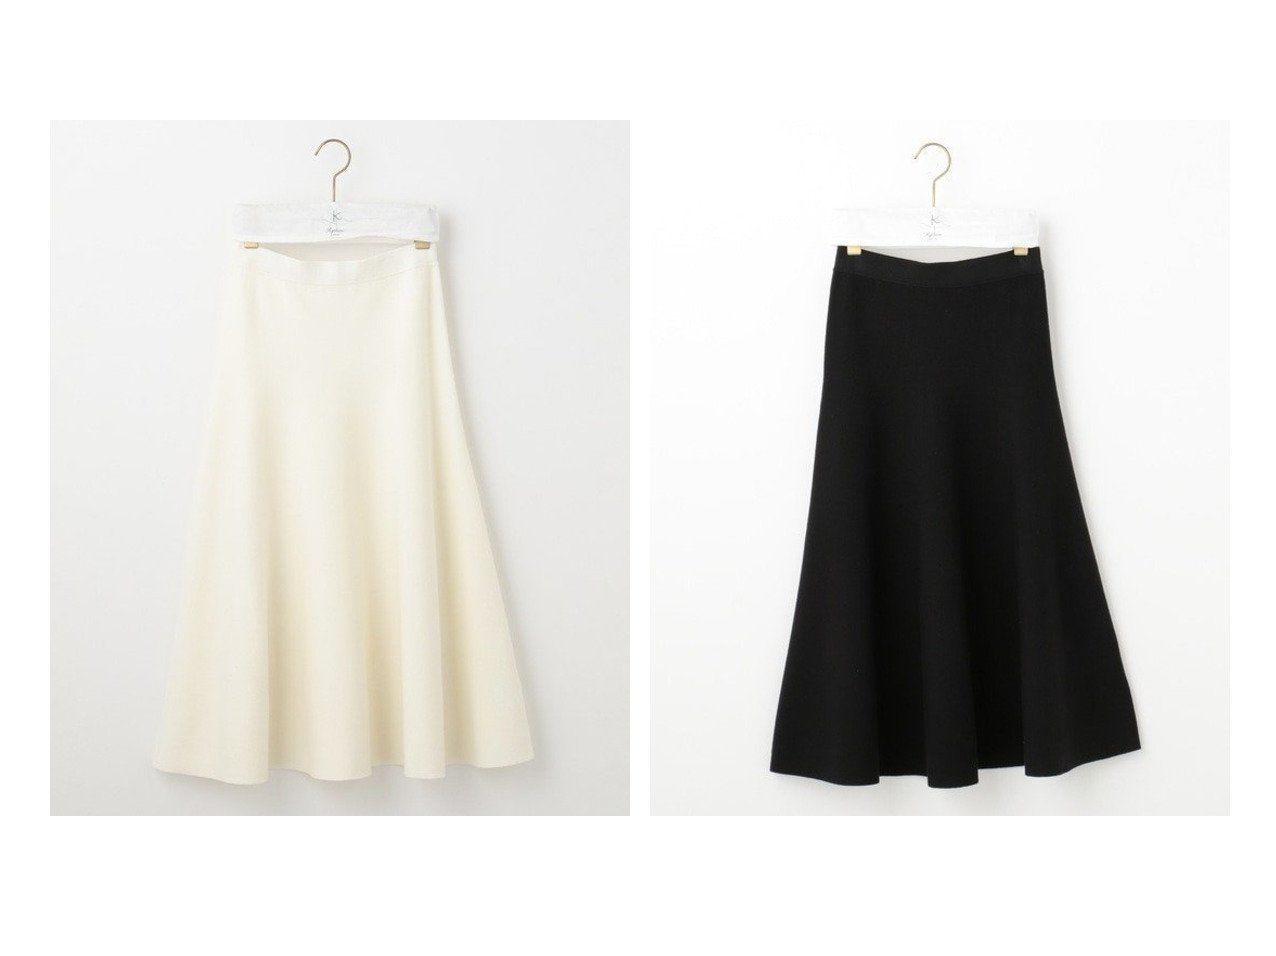 【KUMIKYOKU/組曲】の【Rythme KUMIKYOKU】Minimalism フレアスカート スカートのおすすめ!人気、トレンド・レディースファッションの通販 おすすめで人気の流行・トレンド、ファッションの通販商品 メンズファッション・キッズファッション・インテリア・家具・レディースファッション・服の通販 founy(ファニー) https://founy.com/ ファッション Fashion レディースファッション WOMEN スカート Skirt Aライン/フレアスカート Flared A-Line Skirts カラフル フレア プリント モチーフ リゾート 2020年 2020 2020 春夏 S/S SS Spring/Summer 2020 送料無料 Free Shipping |ID:crp329100000013421